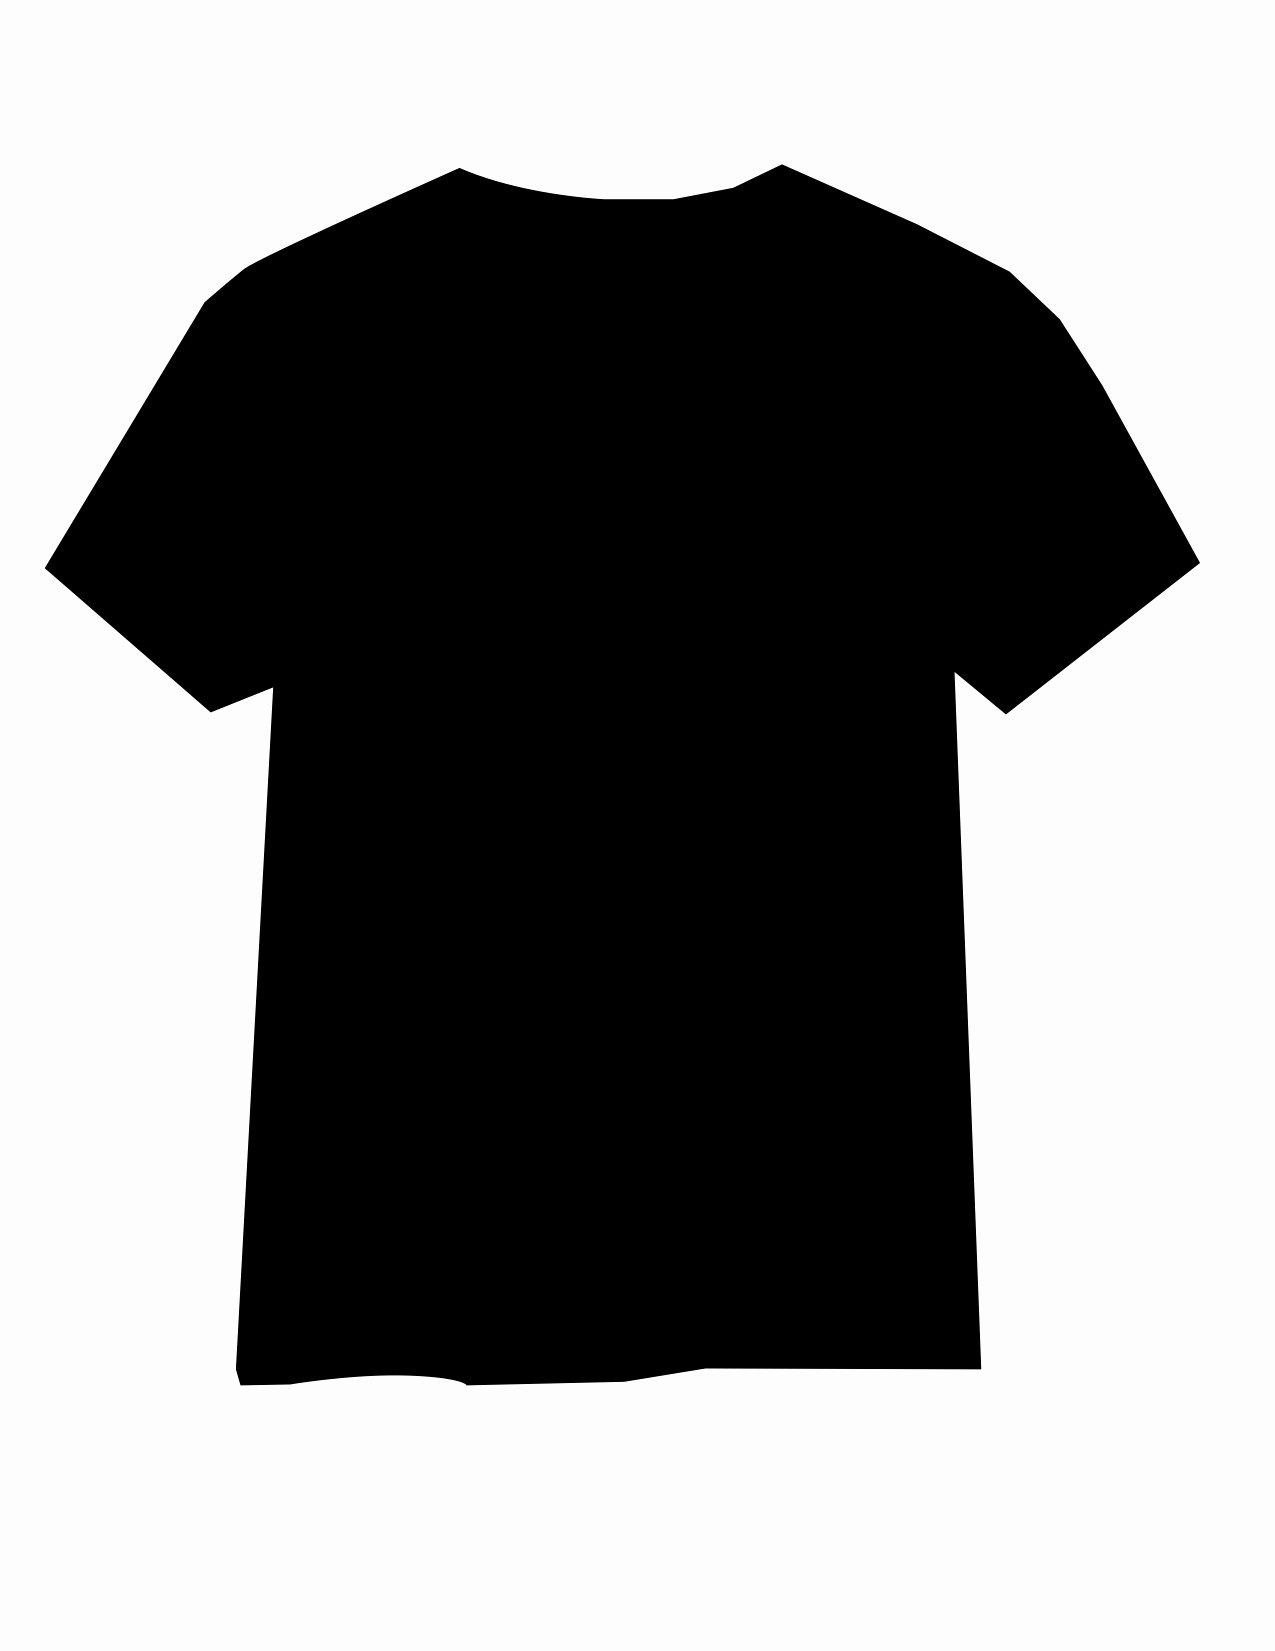 Black T Shirt Template Beautiful Template Design Ideas